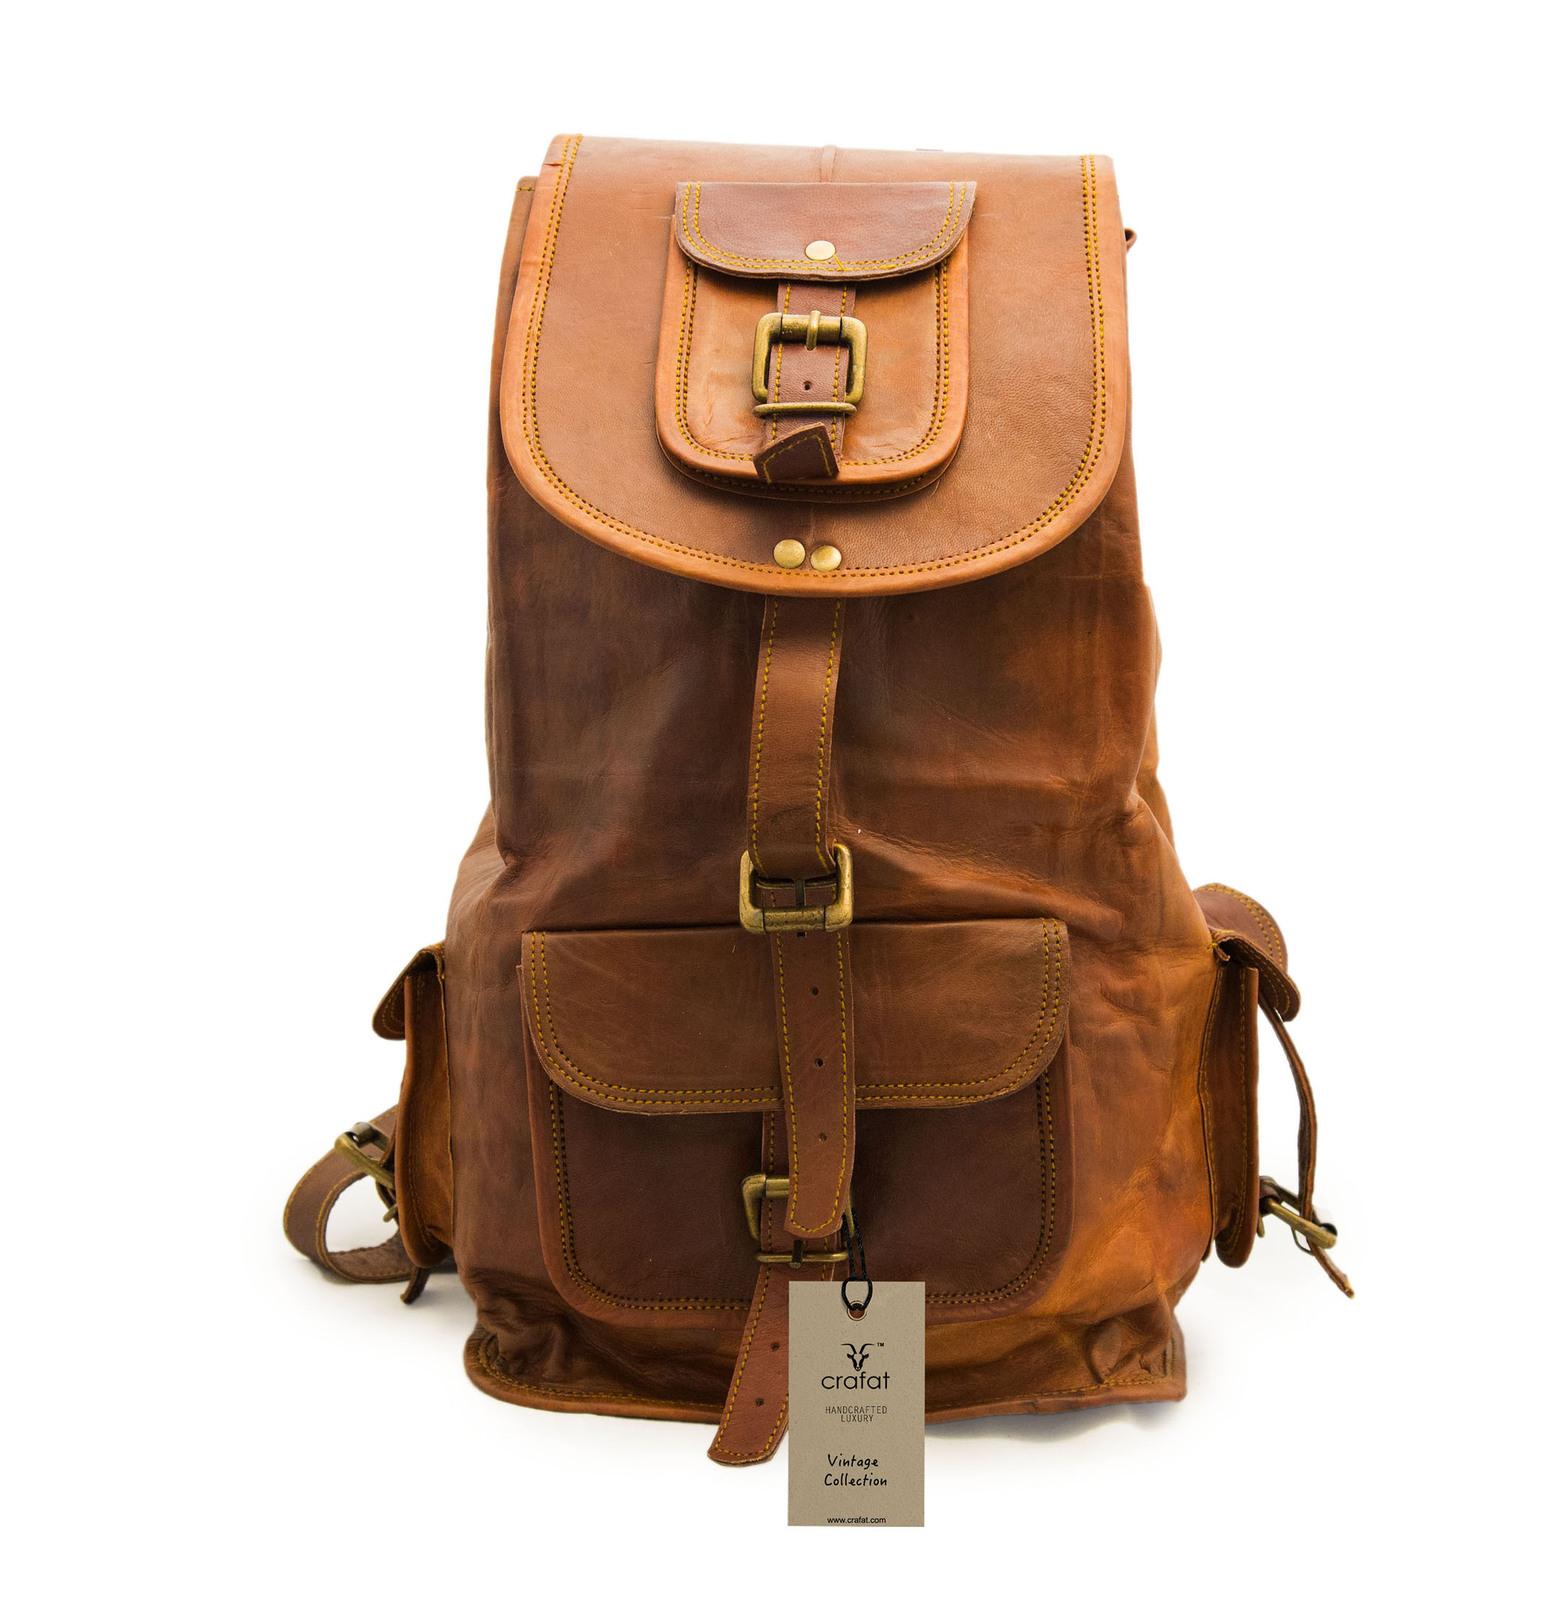 16″ Ladies Leather Backpack Knapsack For Travel & Laptop